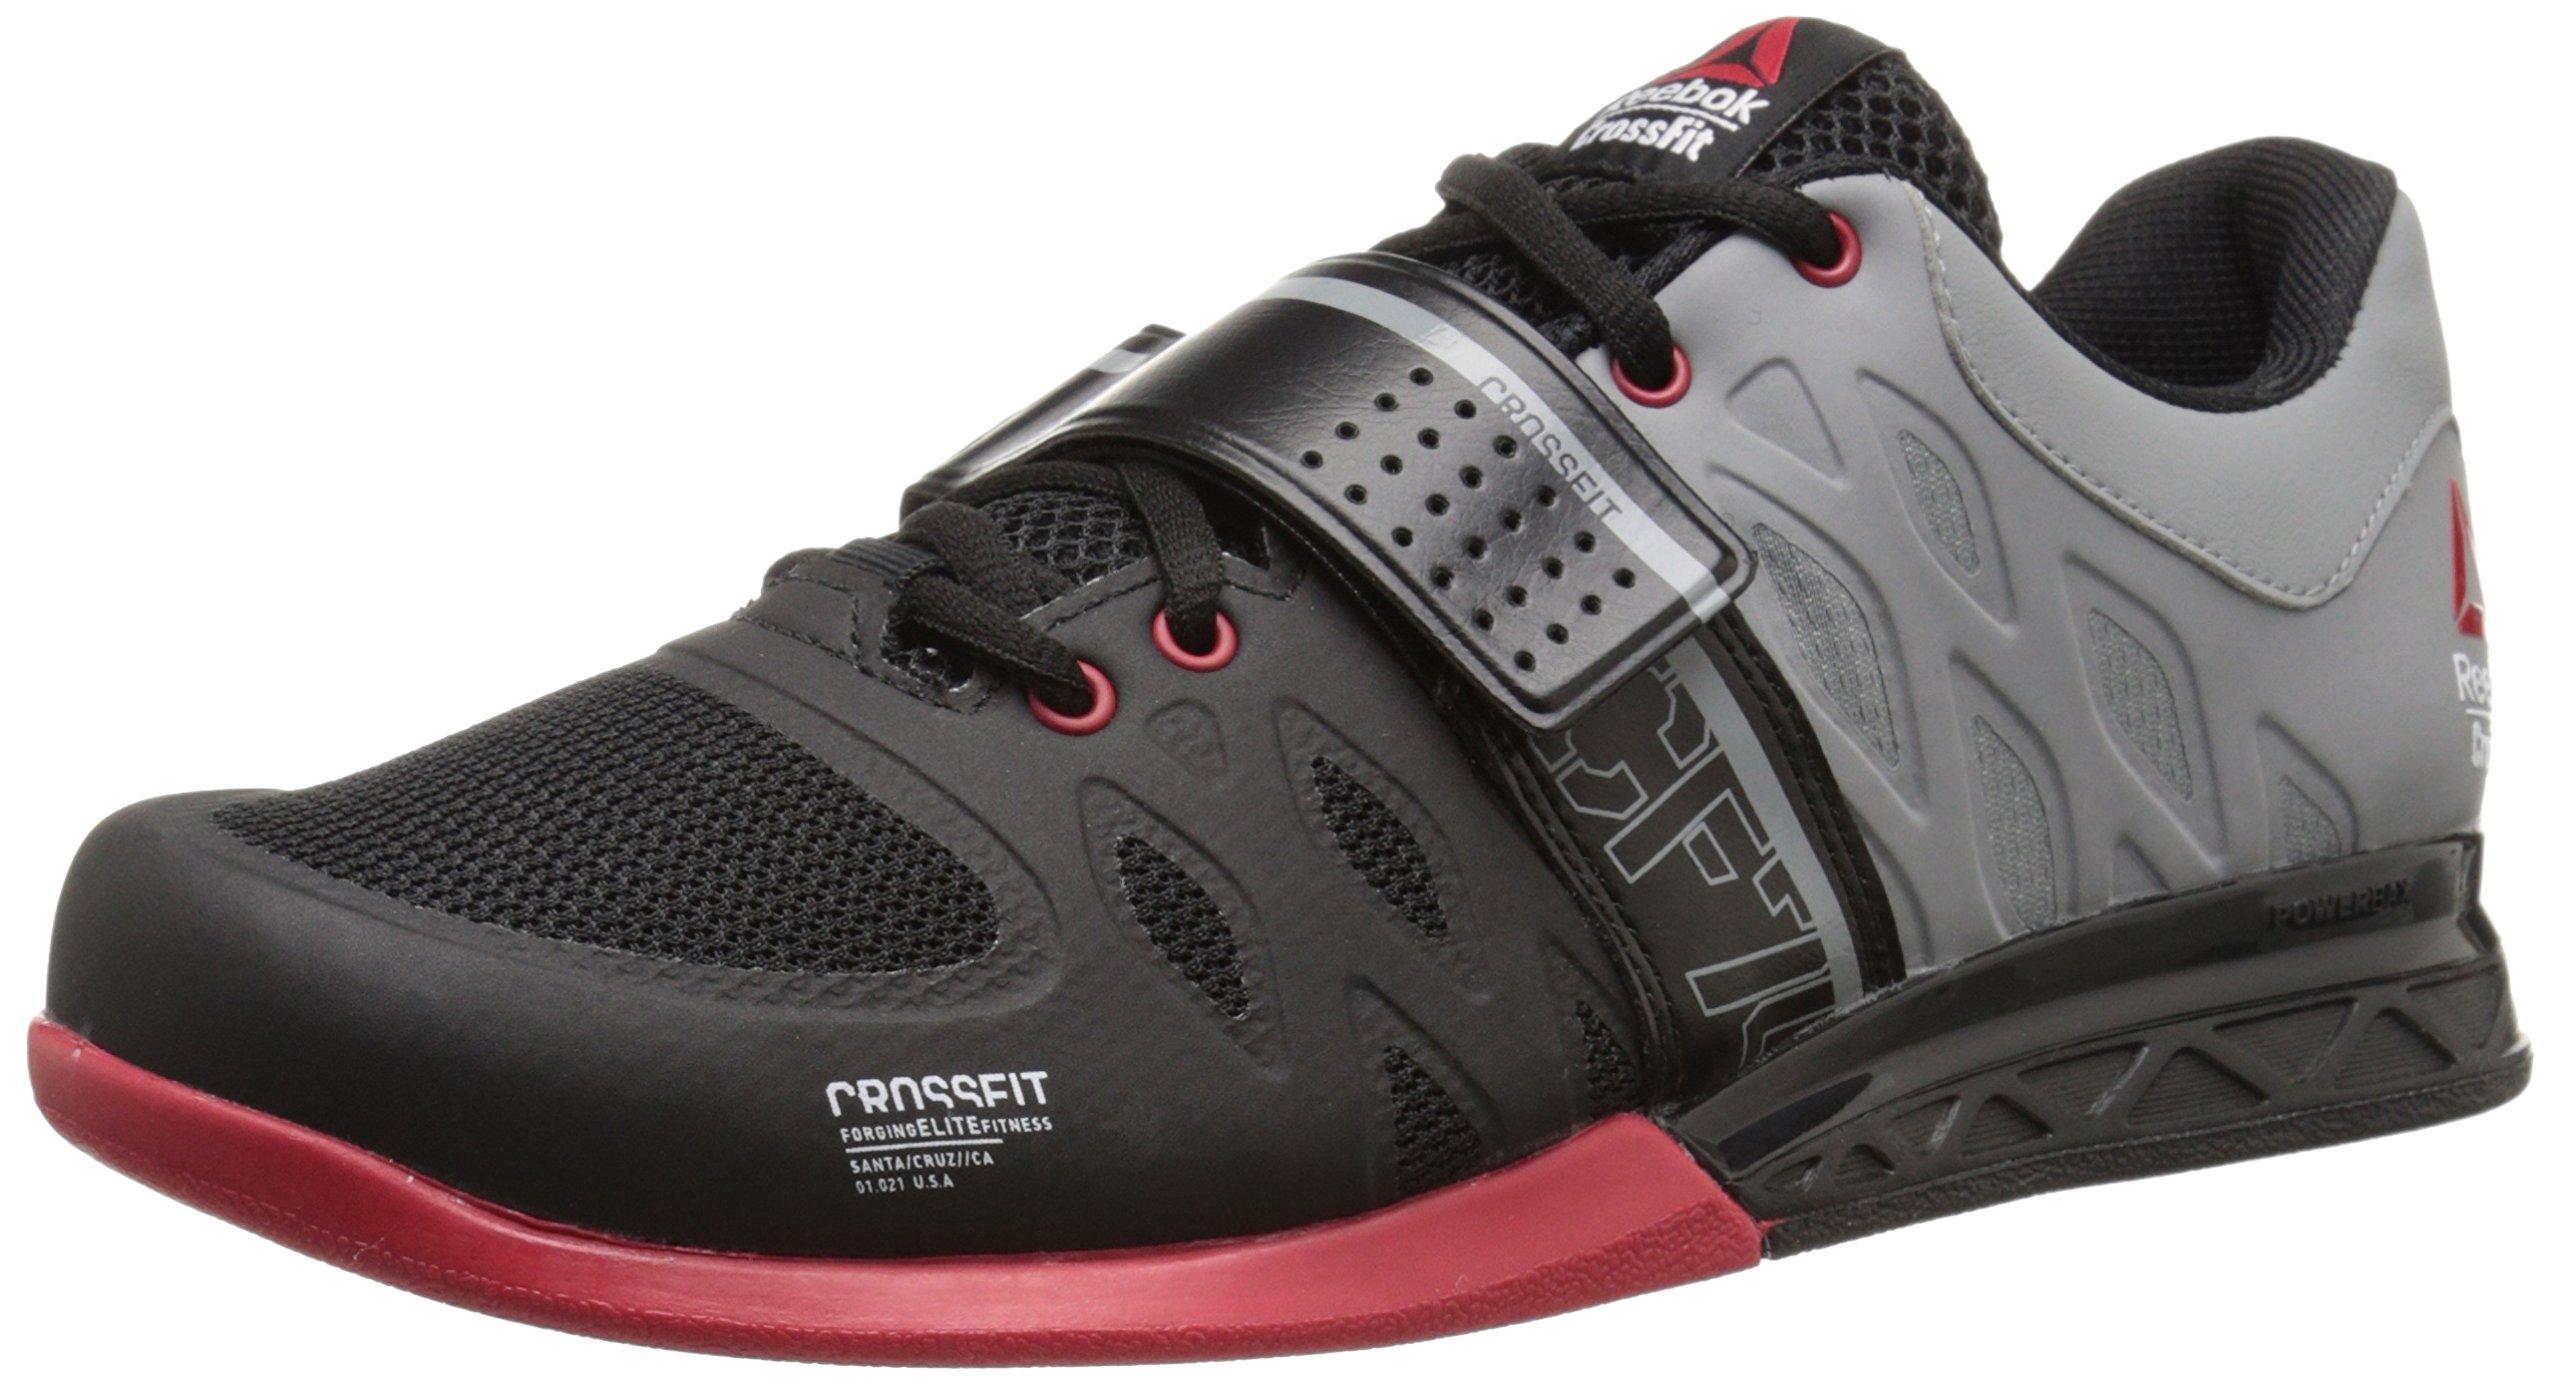 Reebok Men's R Crossfit Lifter 2.0 Training Shoe, Black/Flat Grey/Excellent Red, 13 M US